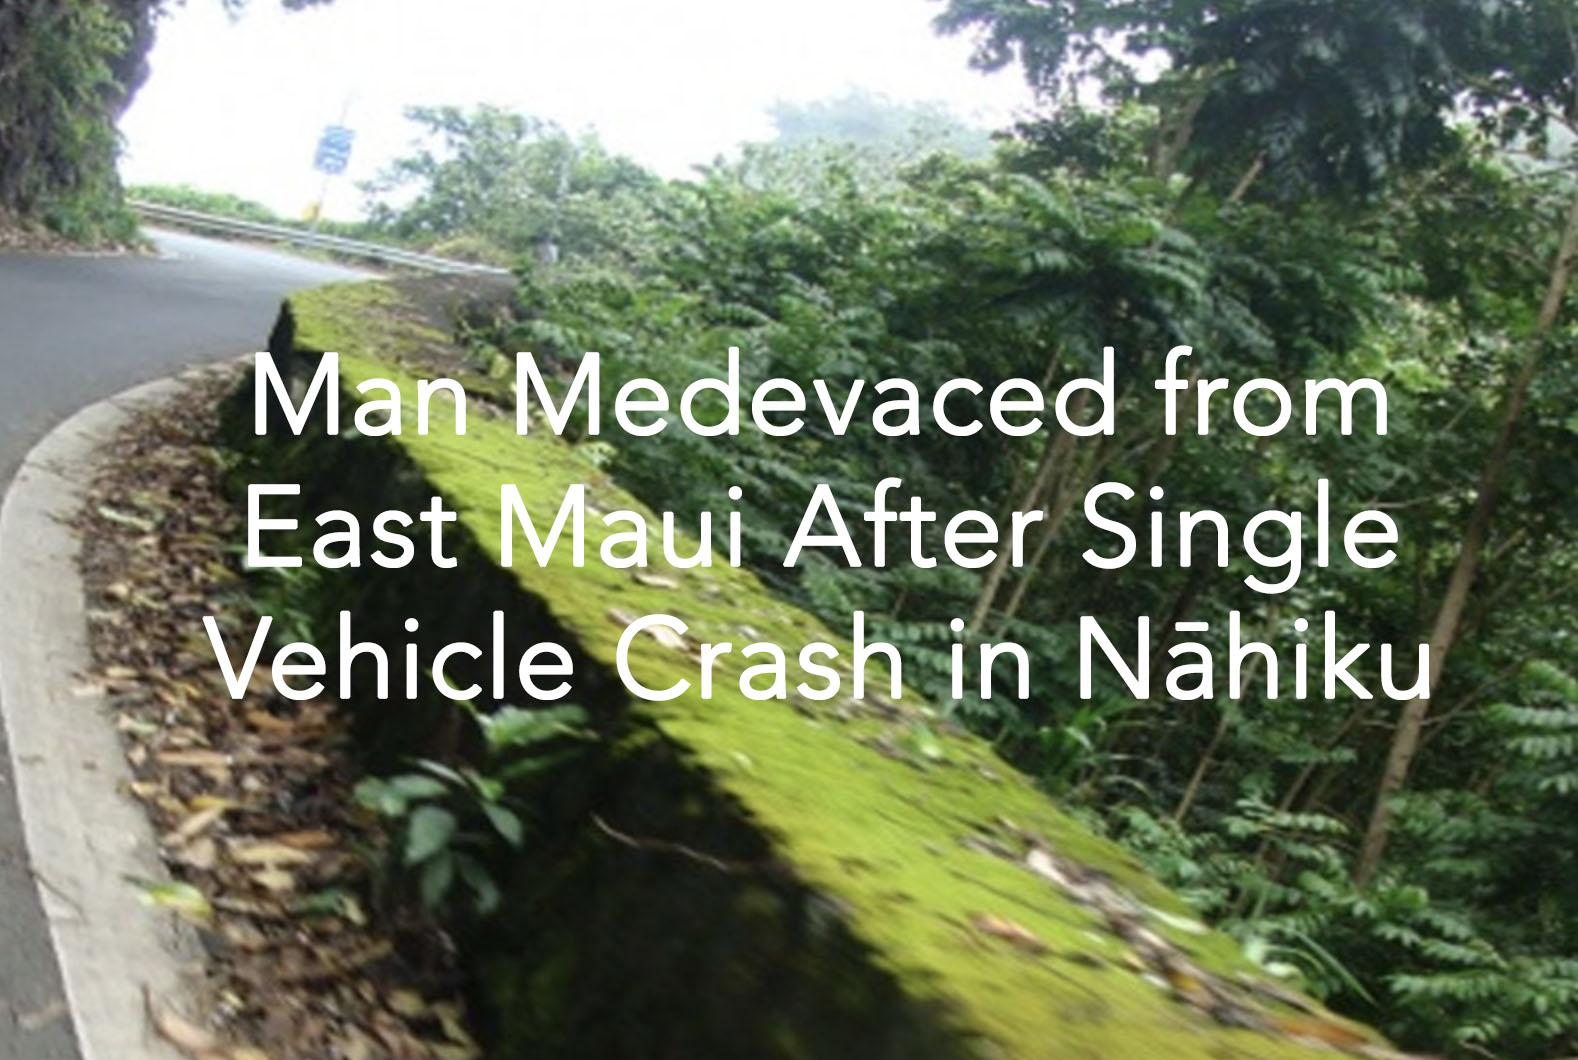 Man Medevaced from East Maui After Single Vehicle Crash in Nāhiku